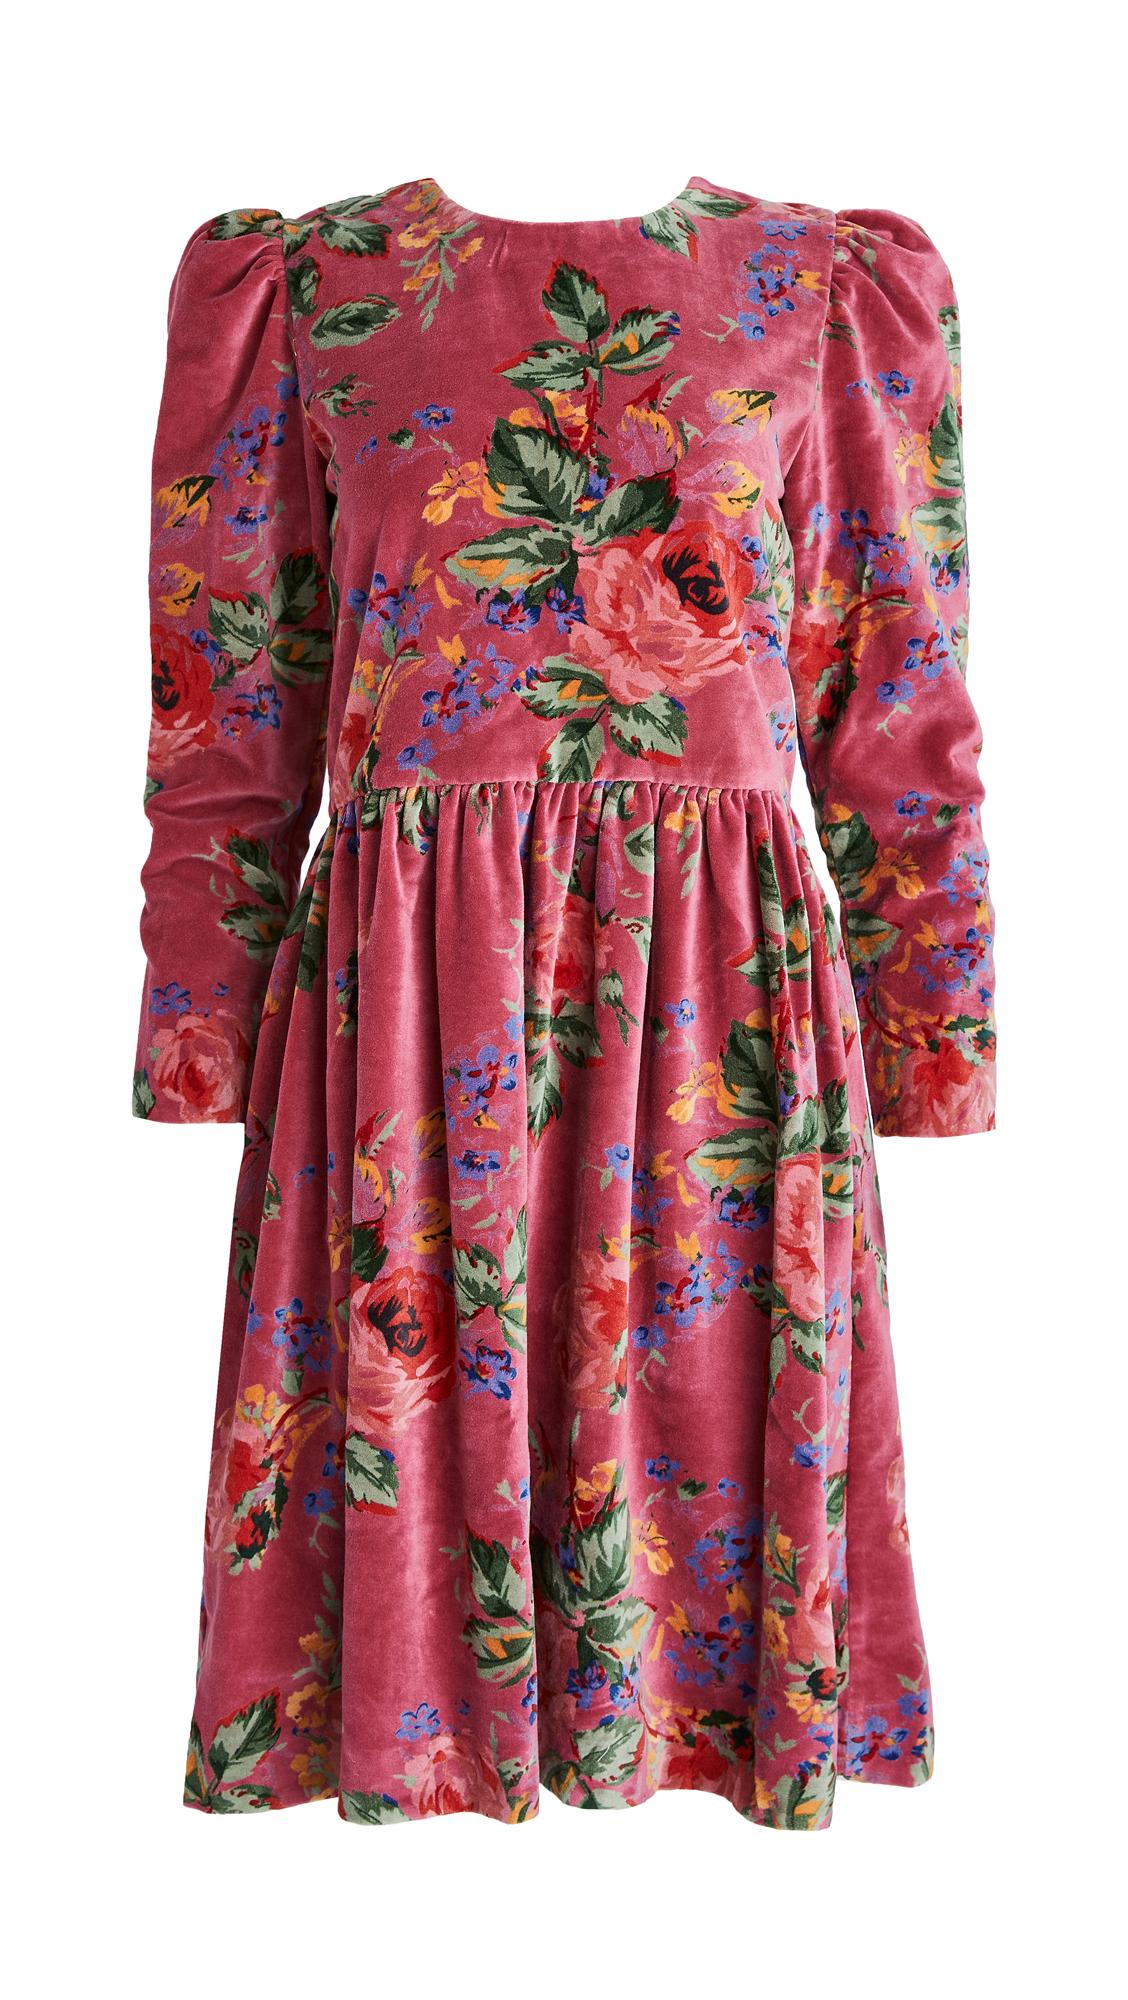 Alix Of Bohemia Ruby Velvet Dress In Pink